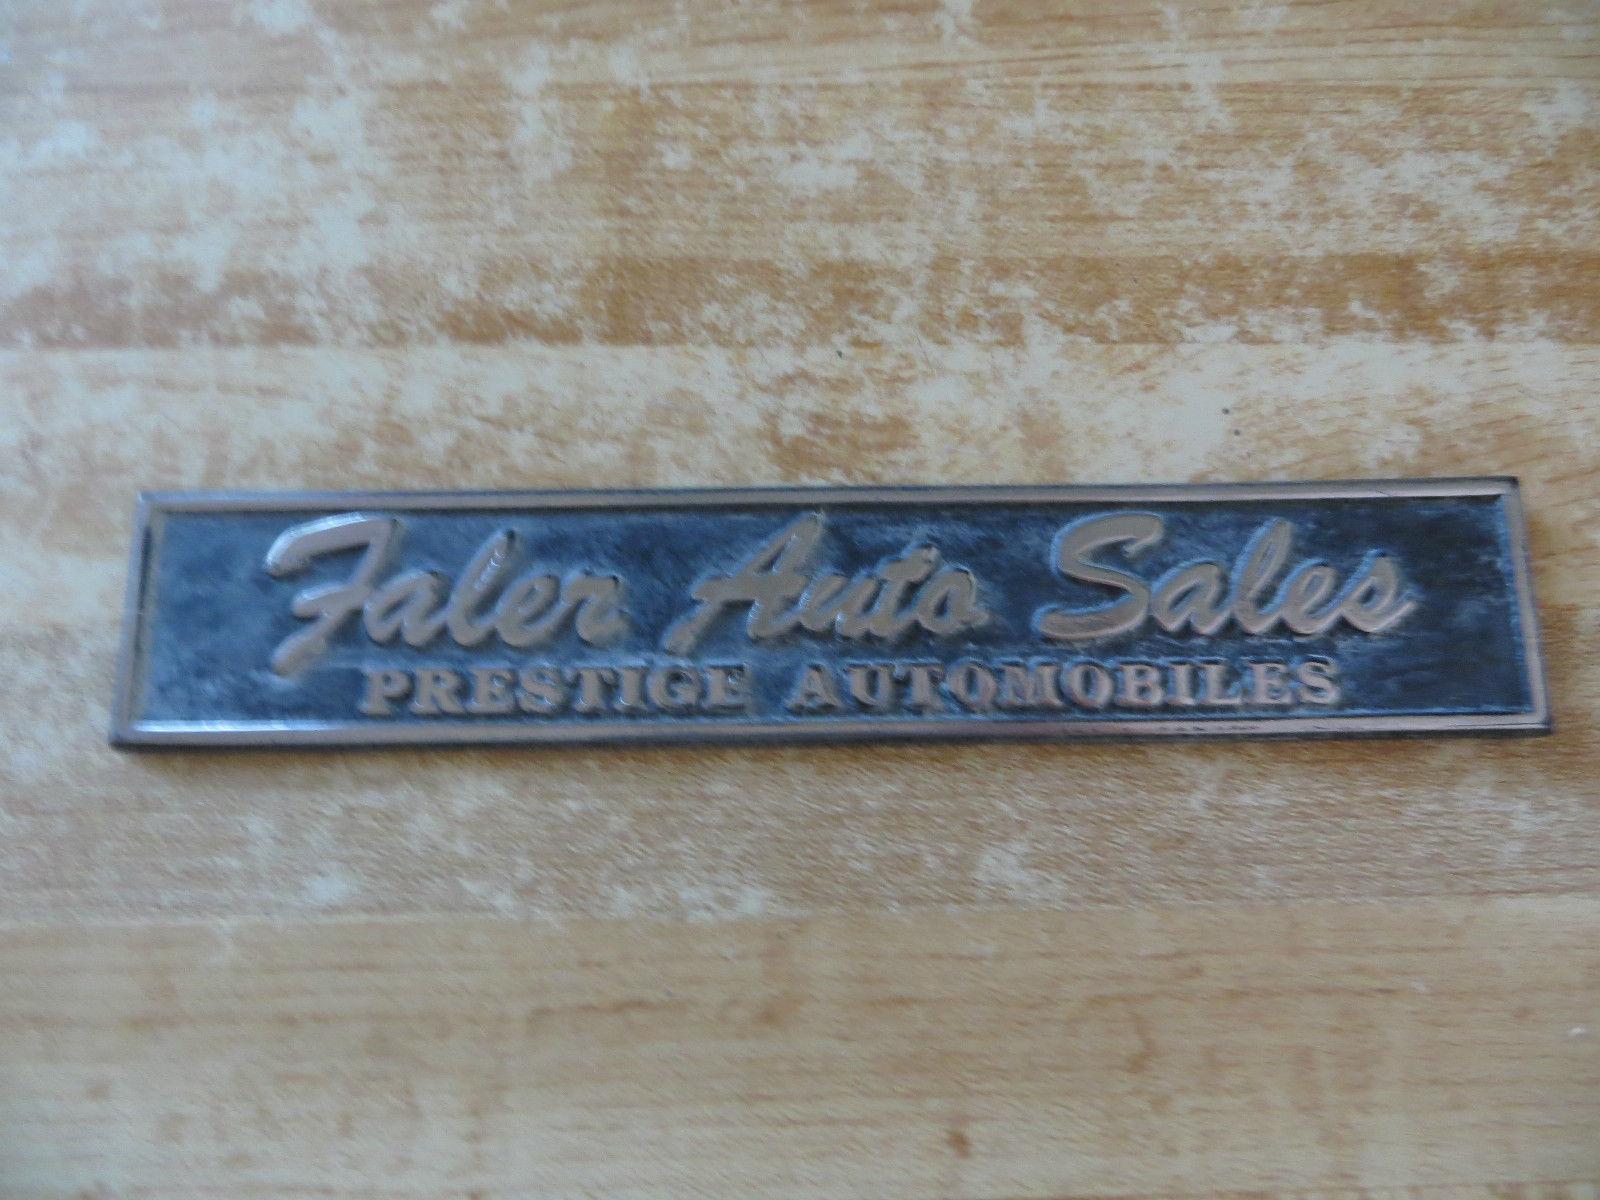 Faler Auto Sales Prestige auto KS dealership and similar items